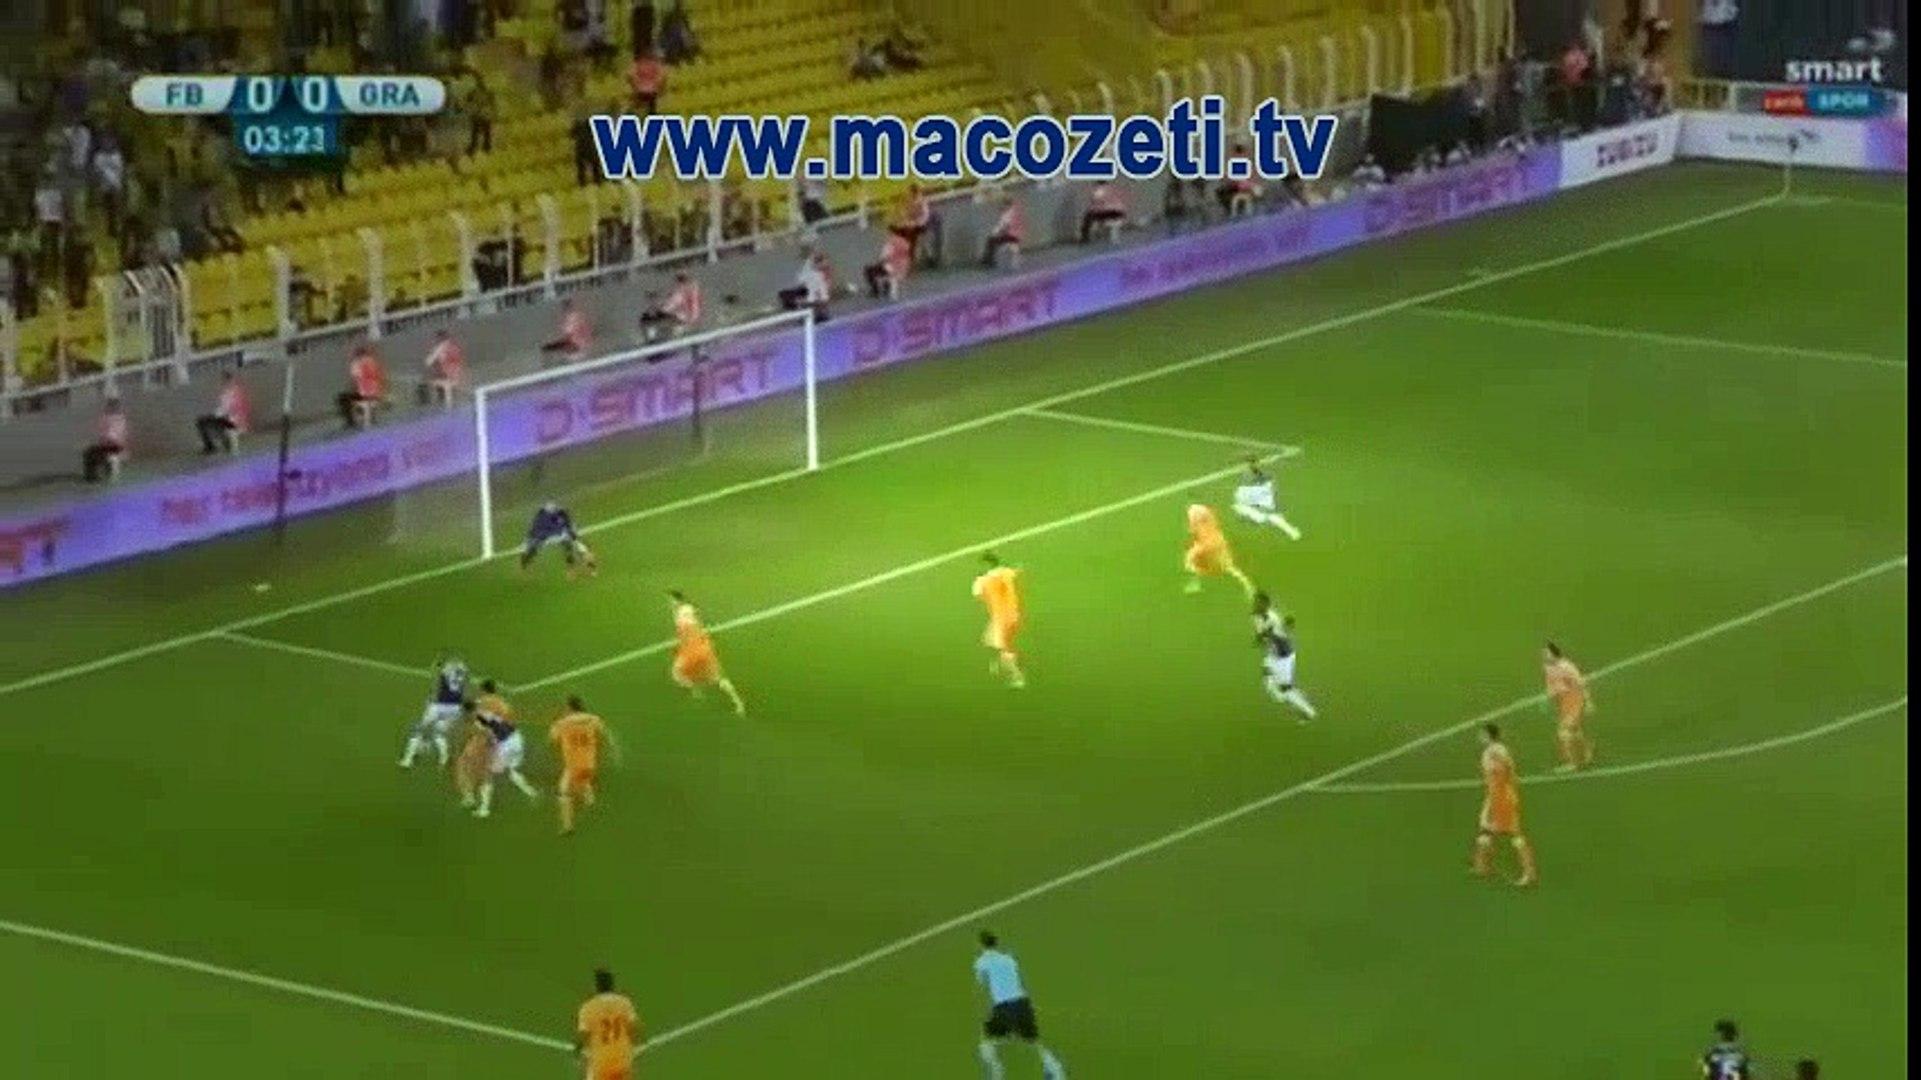 Fenerbahçe 3-0 Grasshoppers   Geniş Maç Özeti   Uefa Avrupa Ligi   www.macozeti.tv